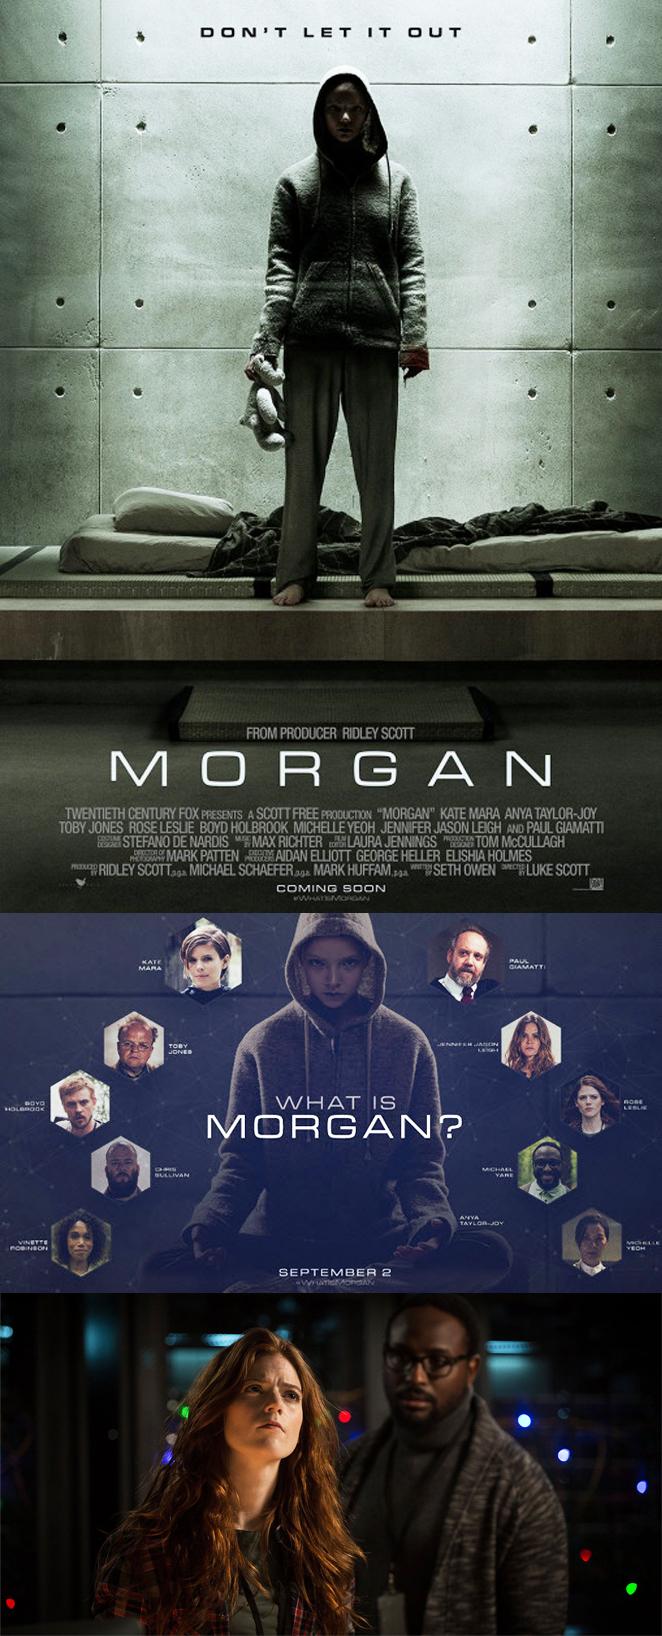 morganpic